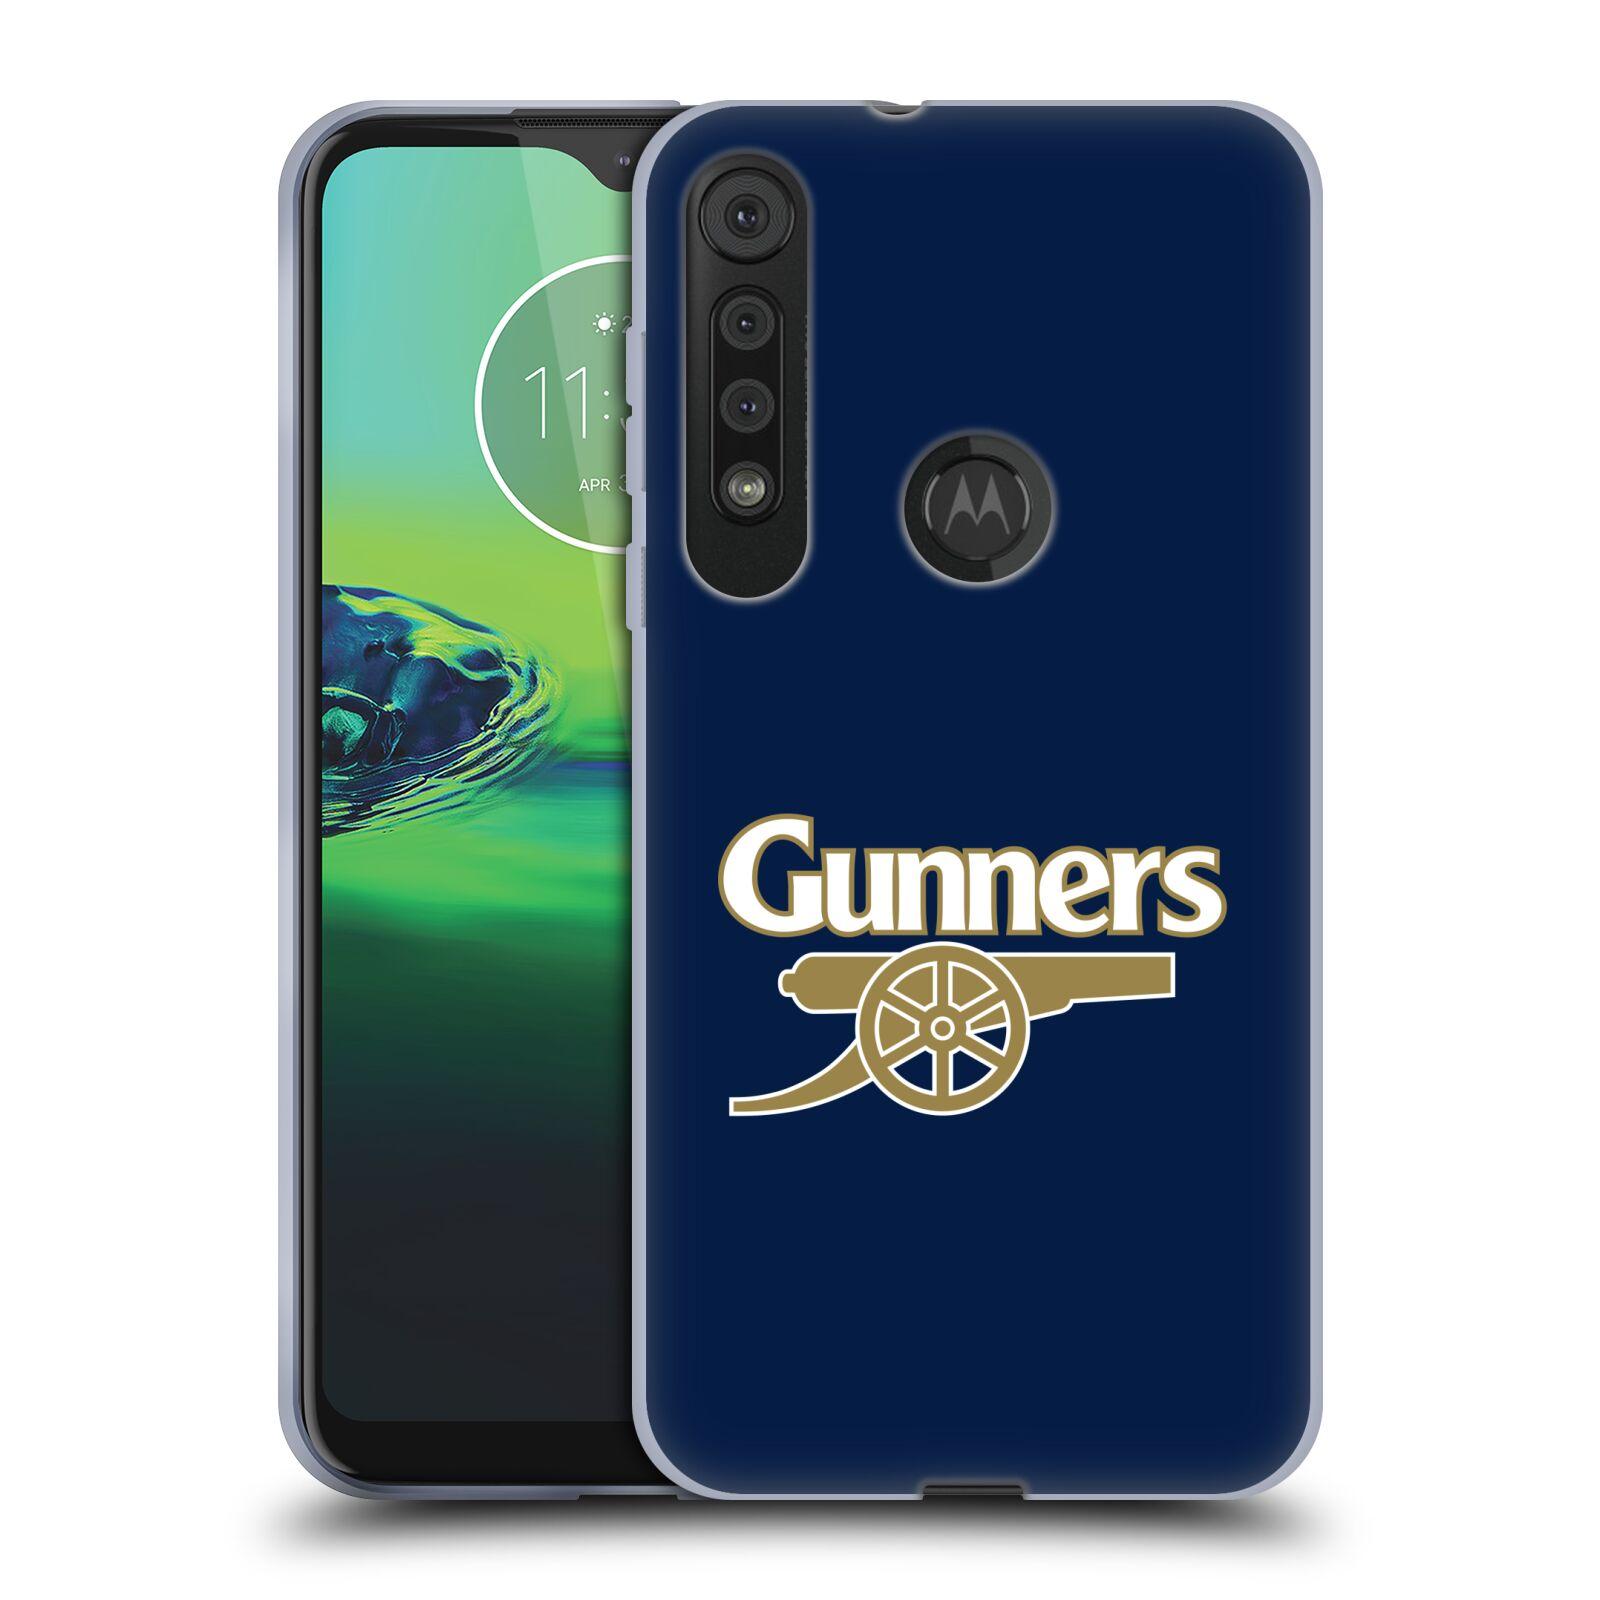 Silikonové pouzdro na mobil Motorola One Macro - Head Case - Arsenal FC - Gunners